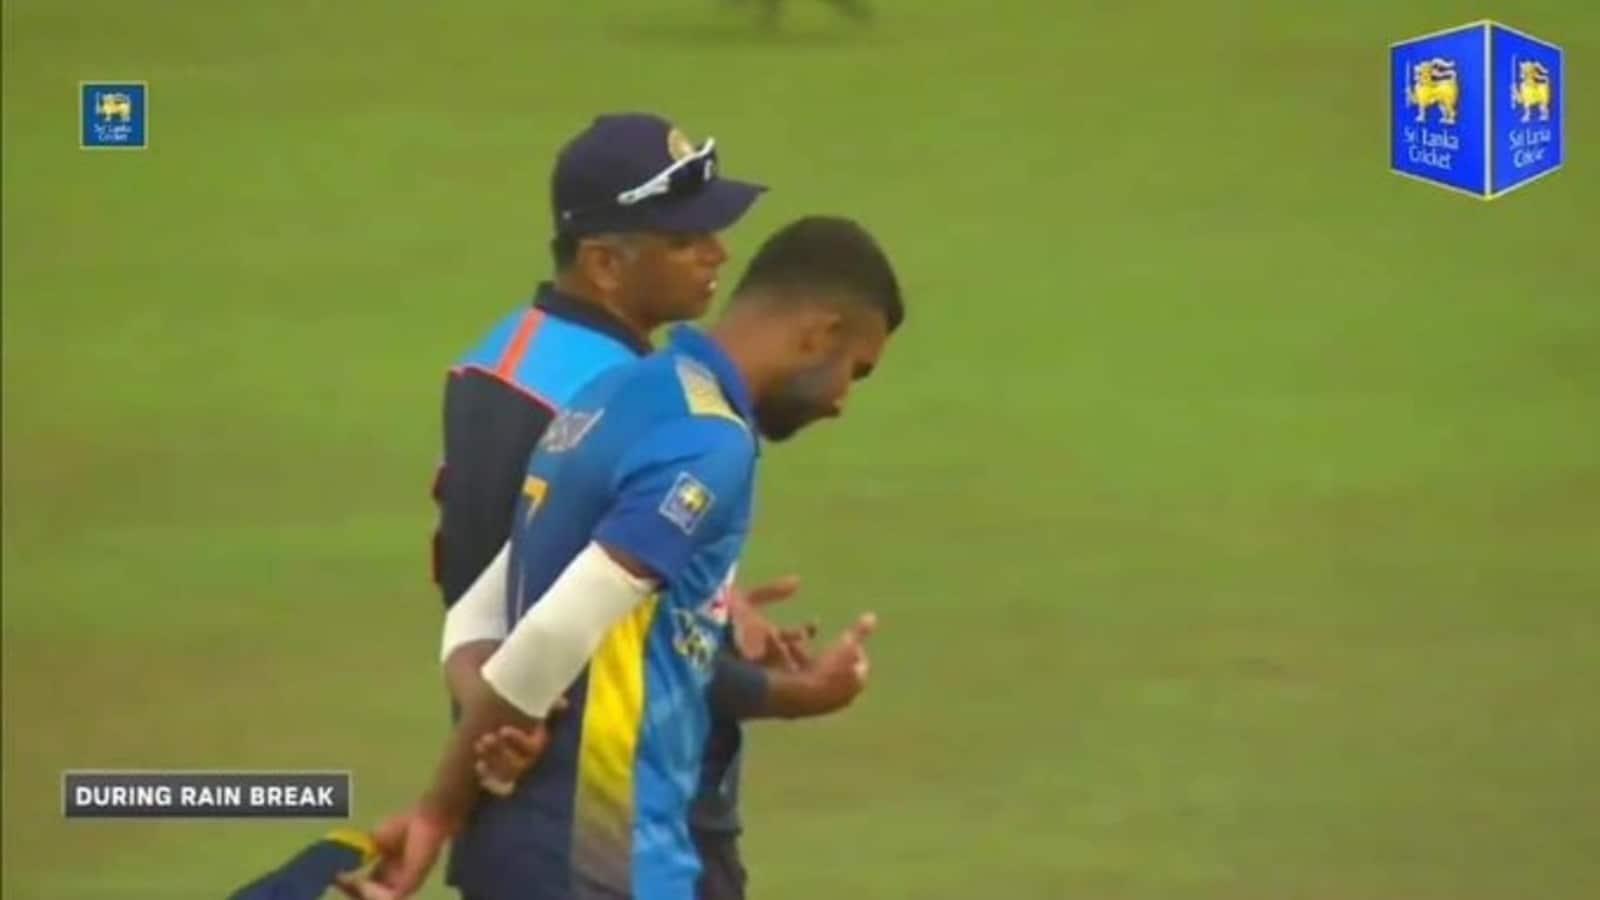 IND vs SL: Dravid's words of wisdom for Sri Lanka captain Dasun Shanka  during rain break   Cricket - Hindustan Times